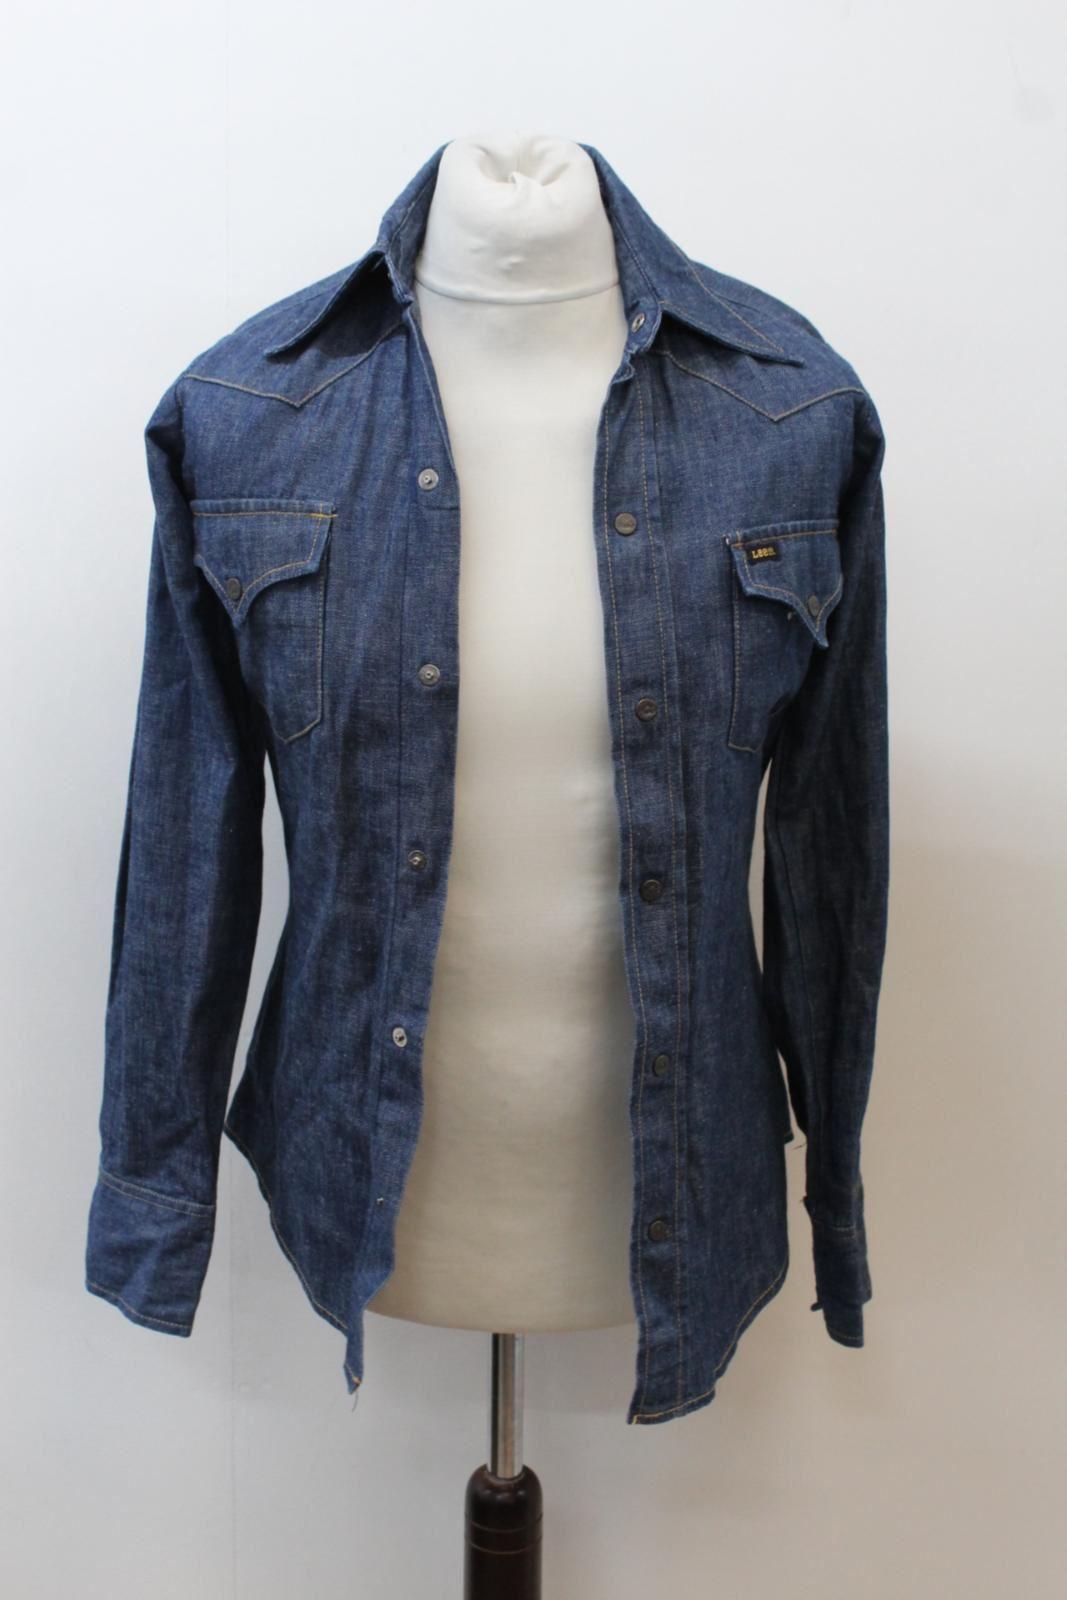 Lee-Jeans-de-hombre-Vintage-Denim-Azul-Algodon-con-Corchetes-Cierre-Mangas-Largas-Camisa-S